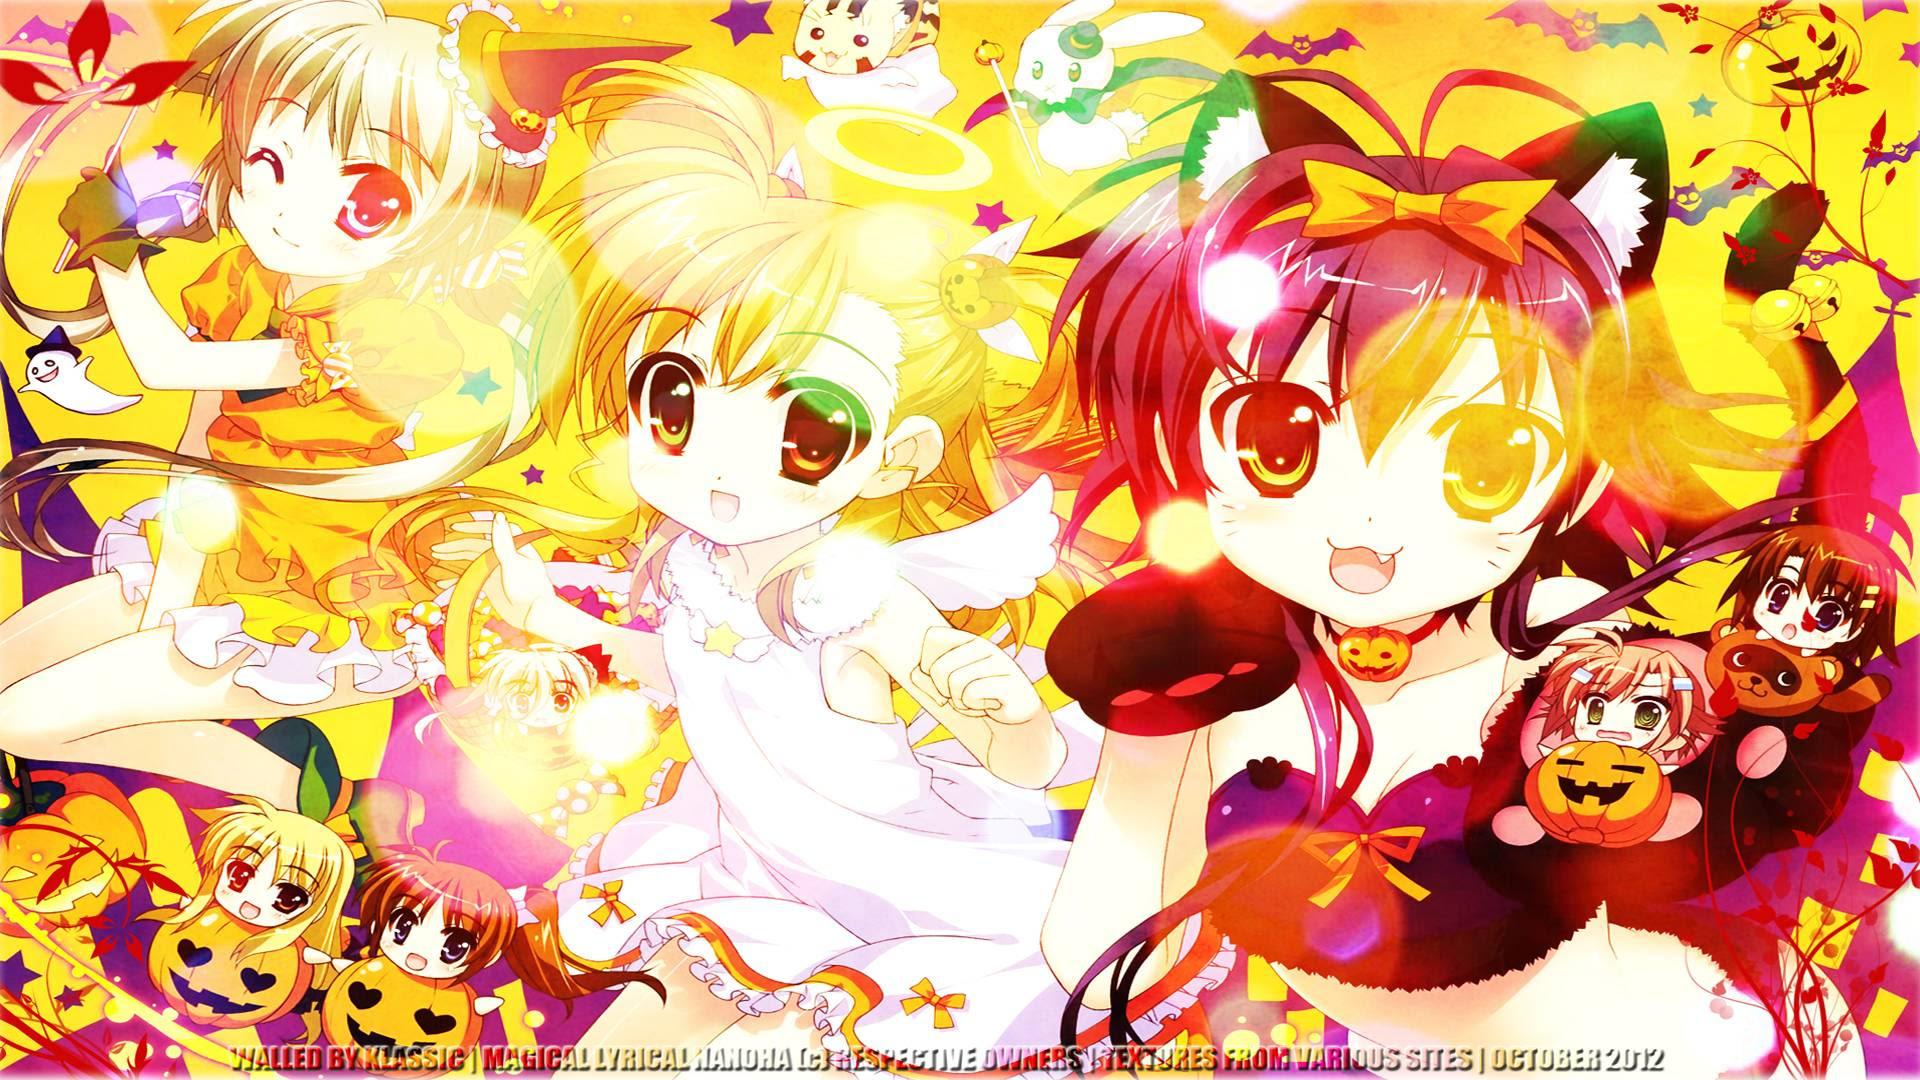 Anime Chibi Wallpapers - Wallpaper Cave